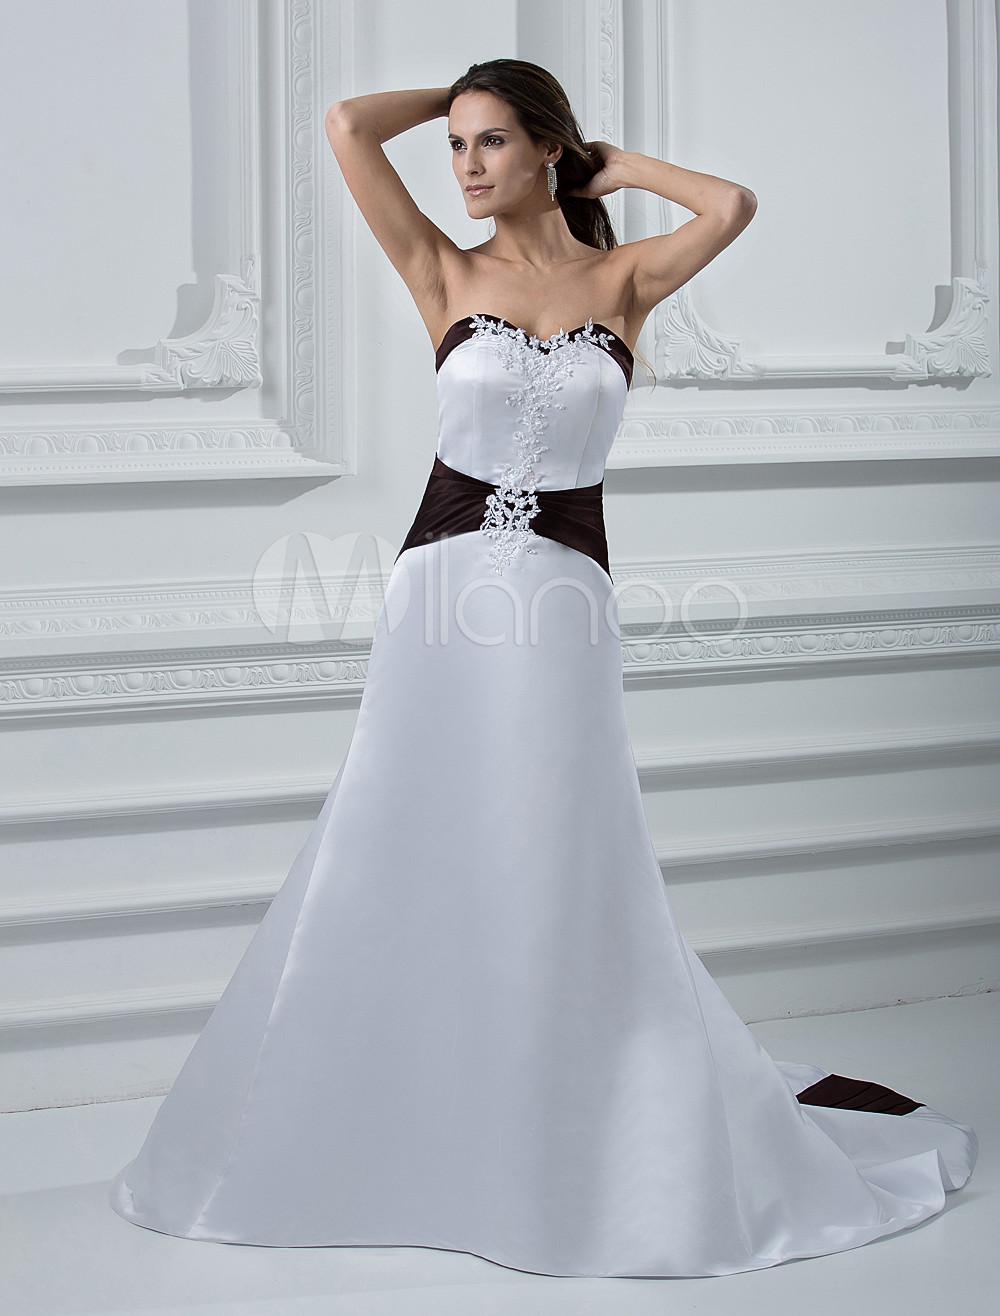 2a16e9428 Vestido de novia de satén con escote en corazón y aplicación de cola ...